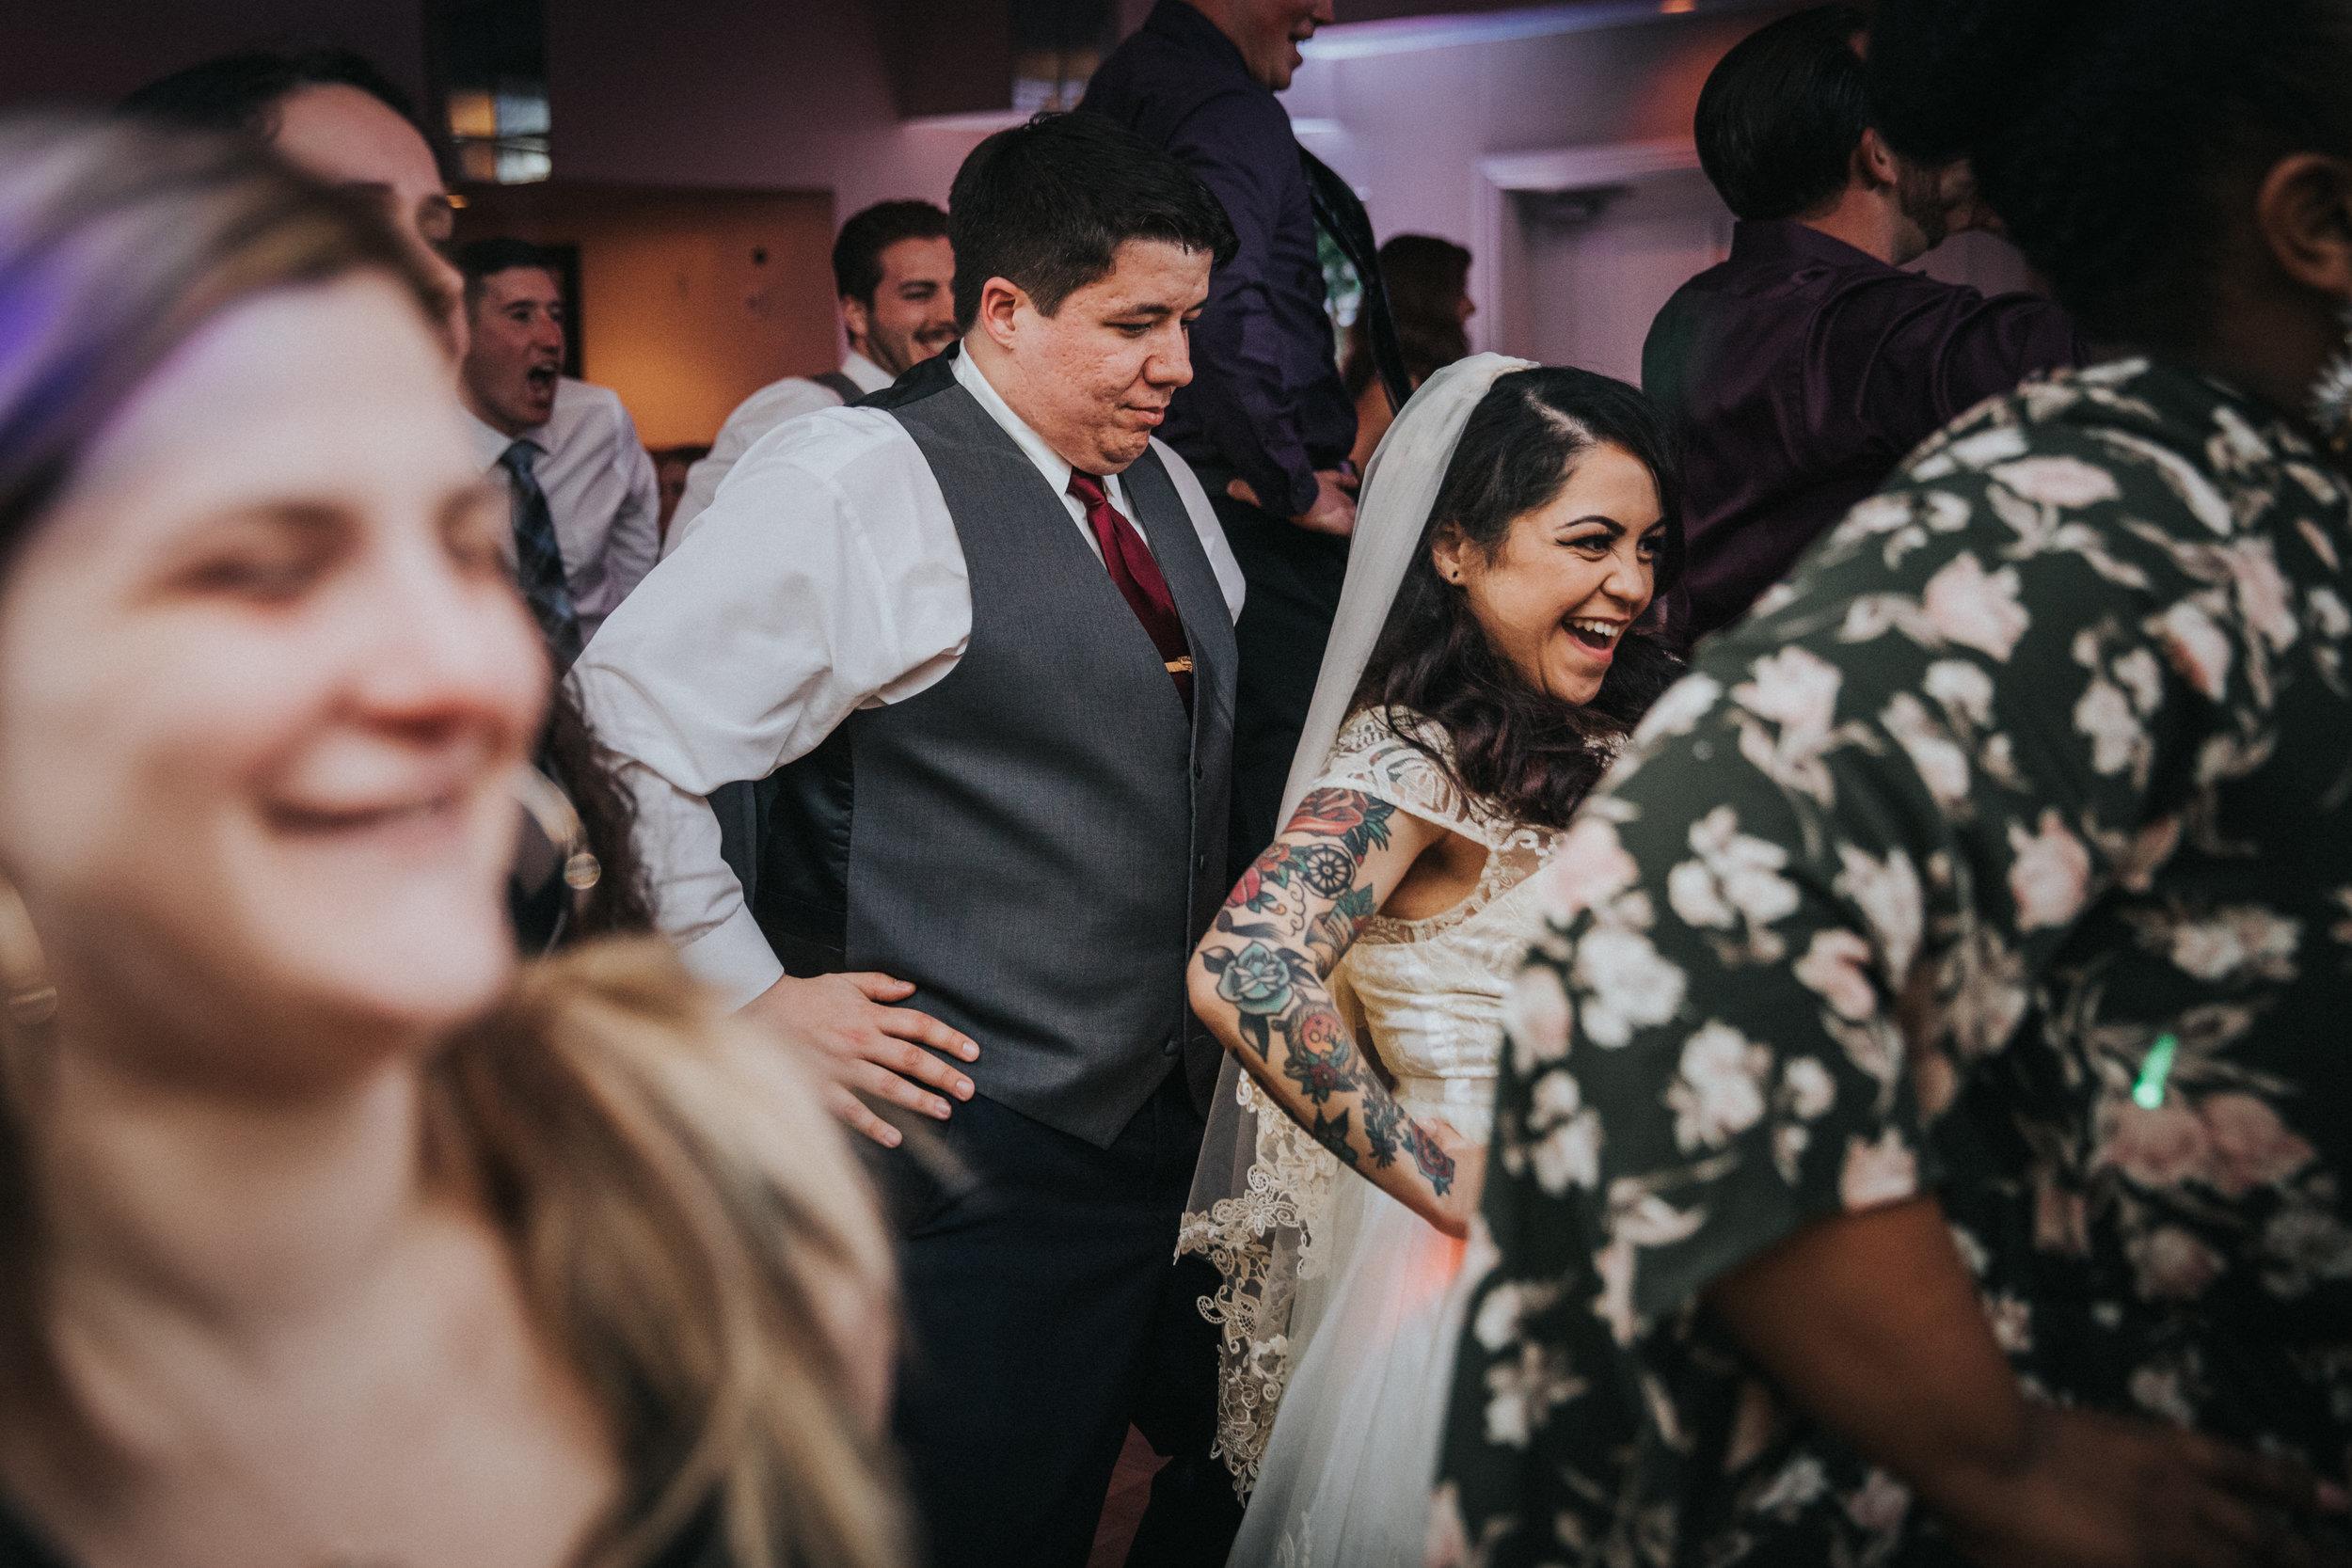 New-Jersey-Wedding-Photographer-ReceptionCenter-Valeria&Mike-Reception (214 of 265).jpg